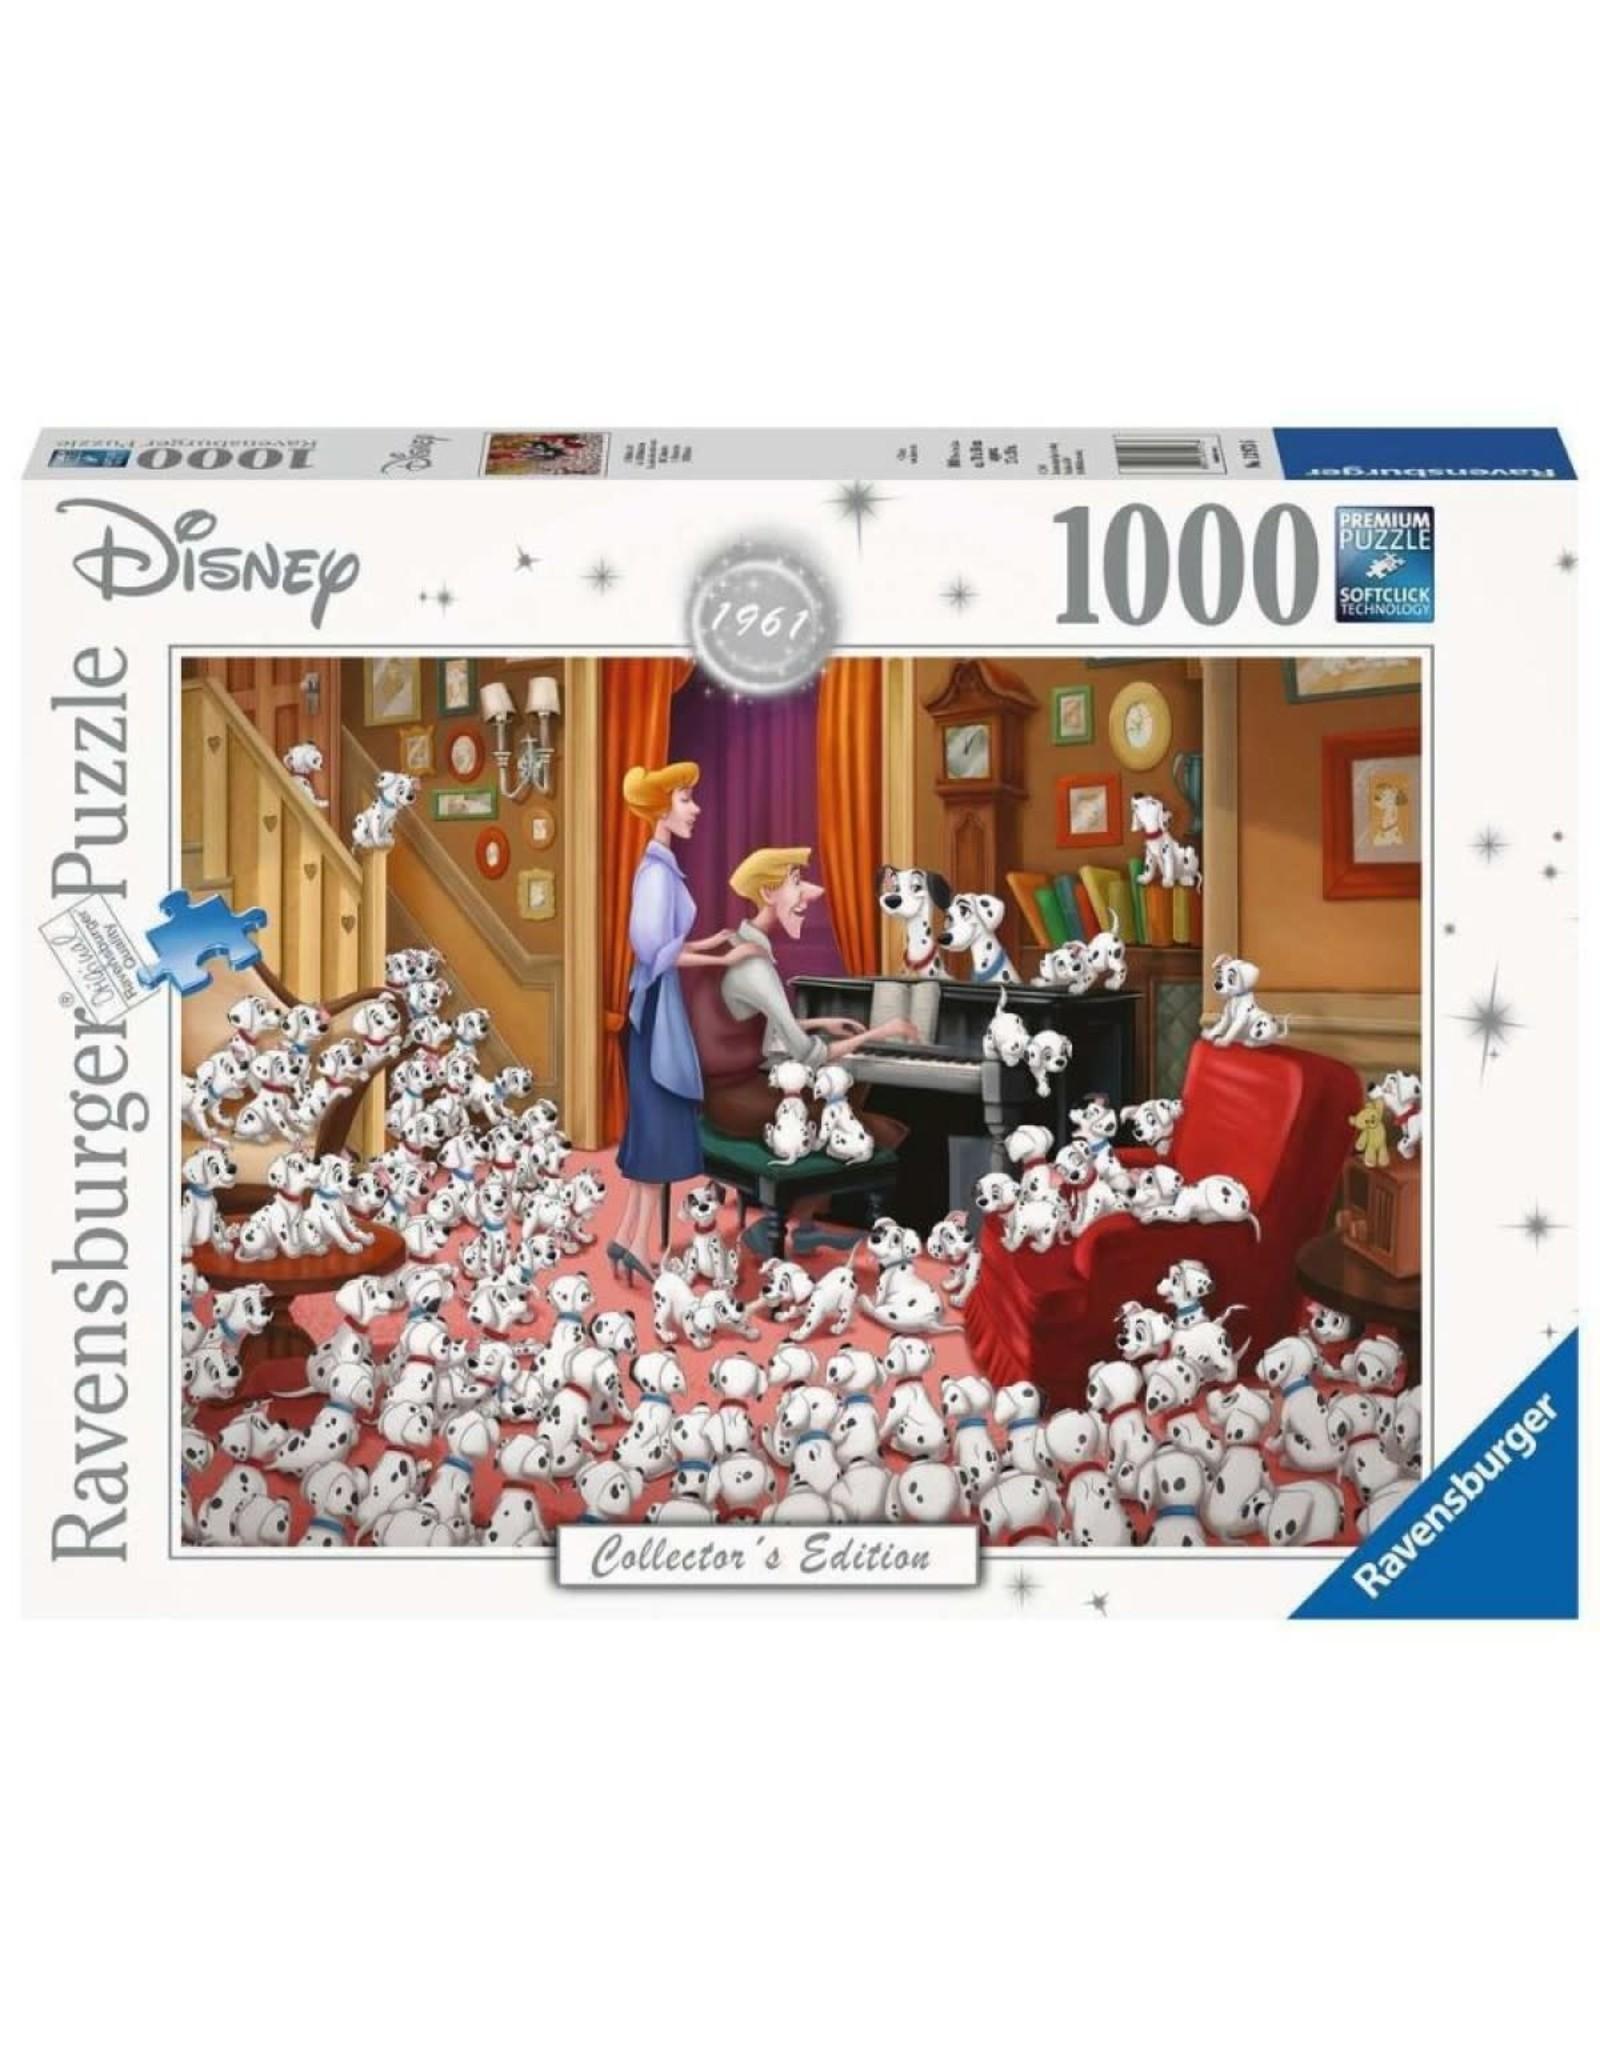 Ravensburger 101 DALMATIANS Puzzle 1000P - Collector's Edition